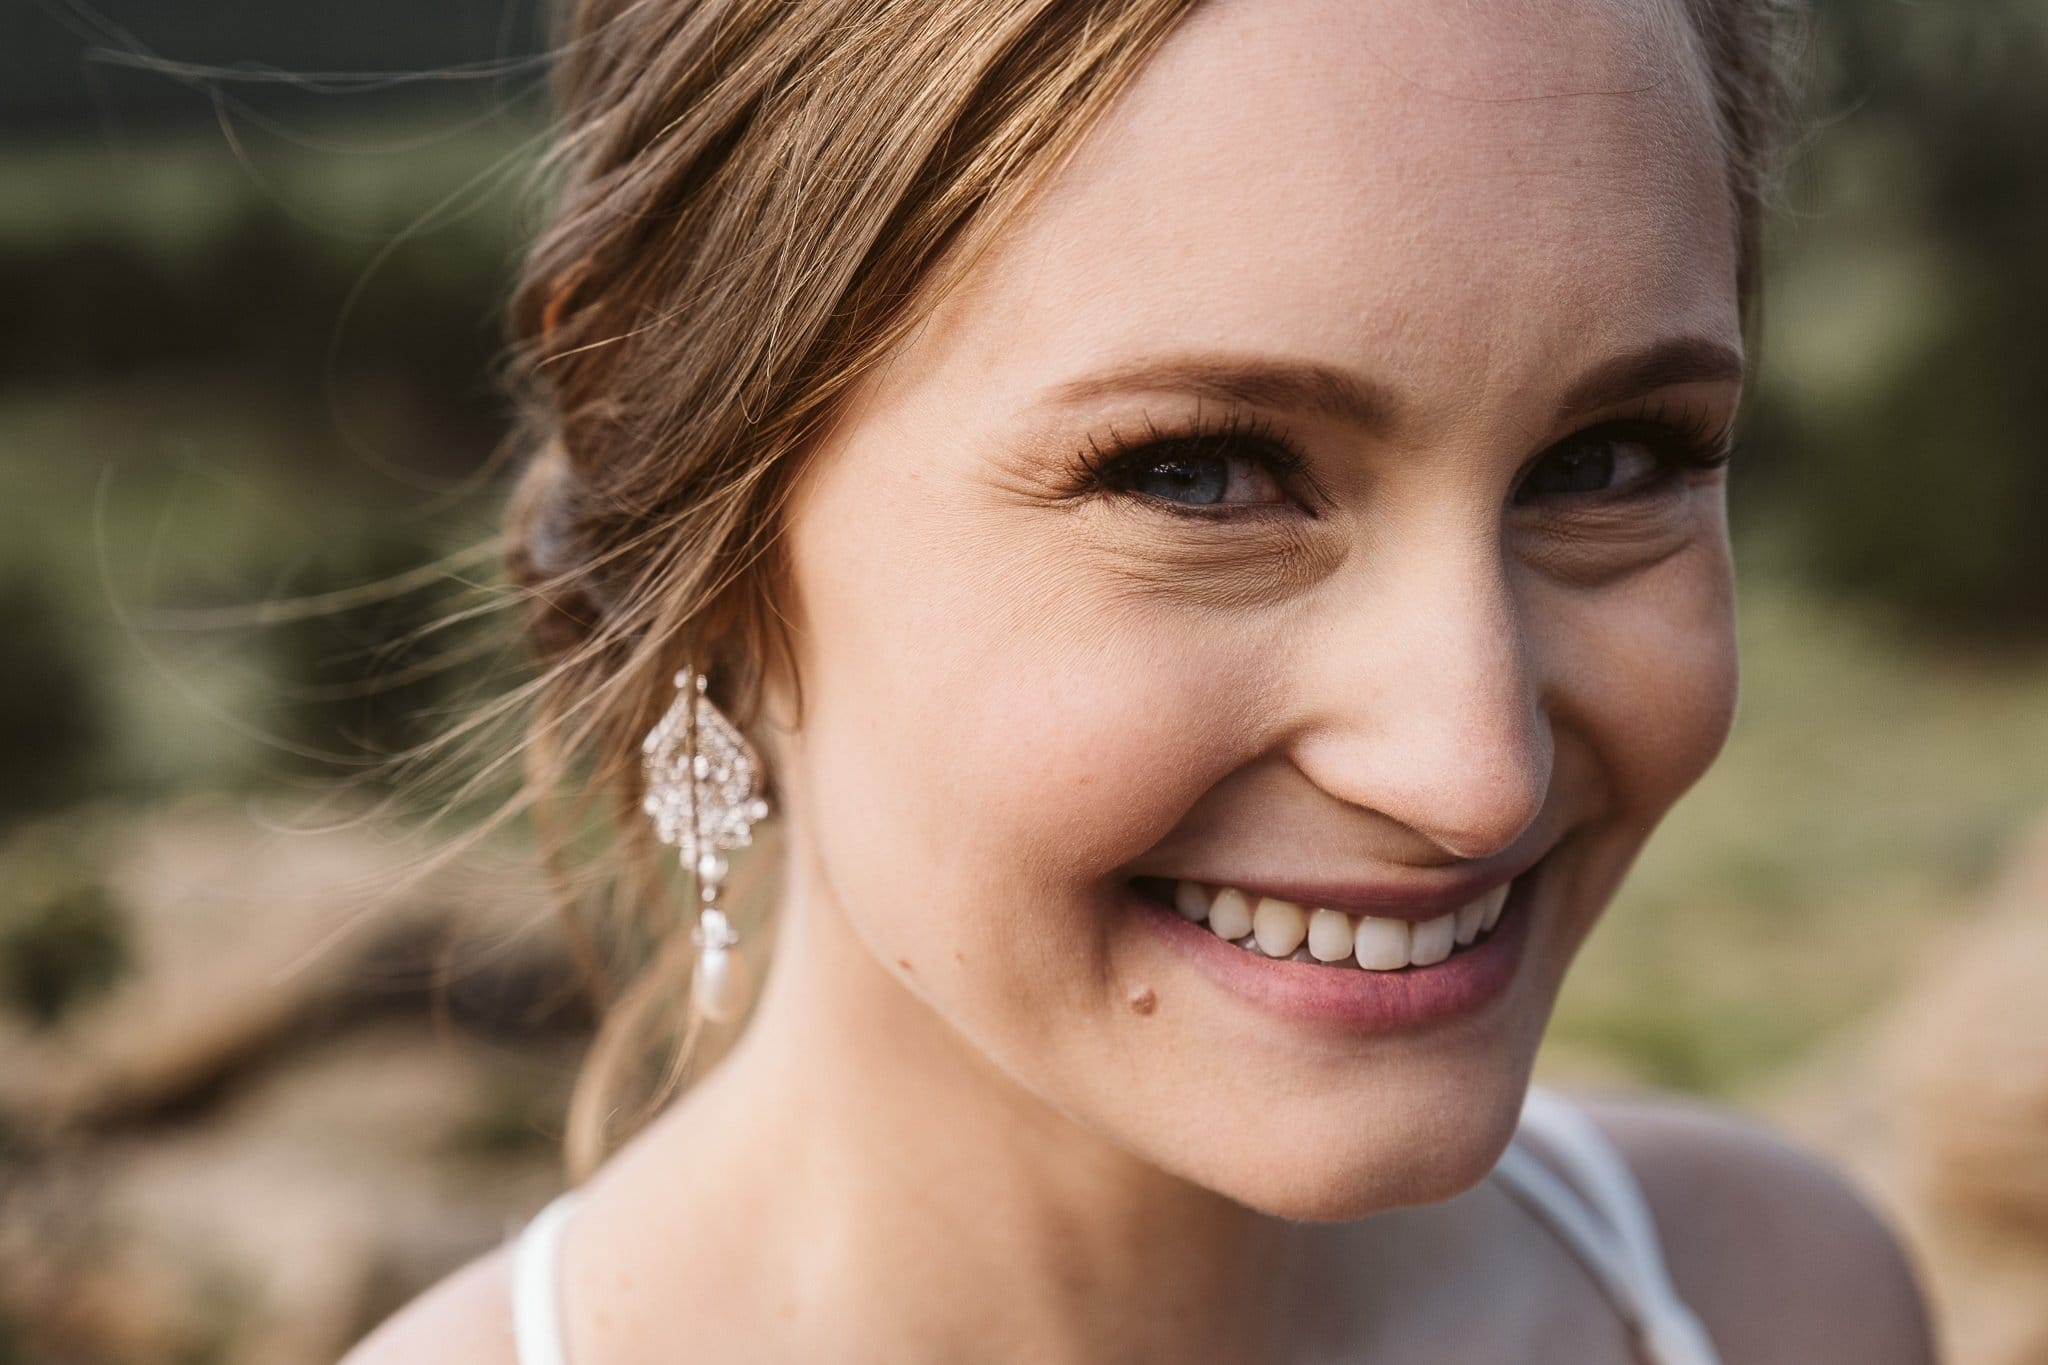 Classic bride makeup look with hair in low bun